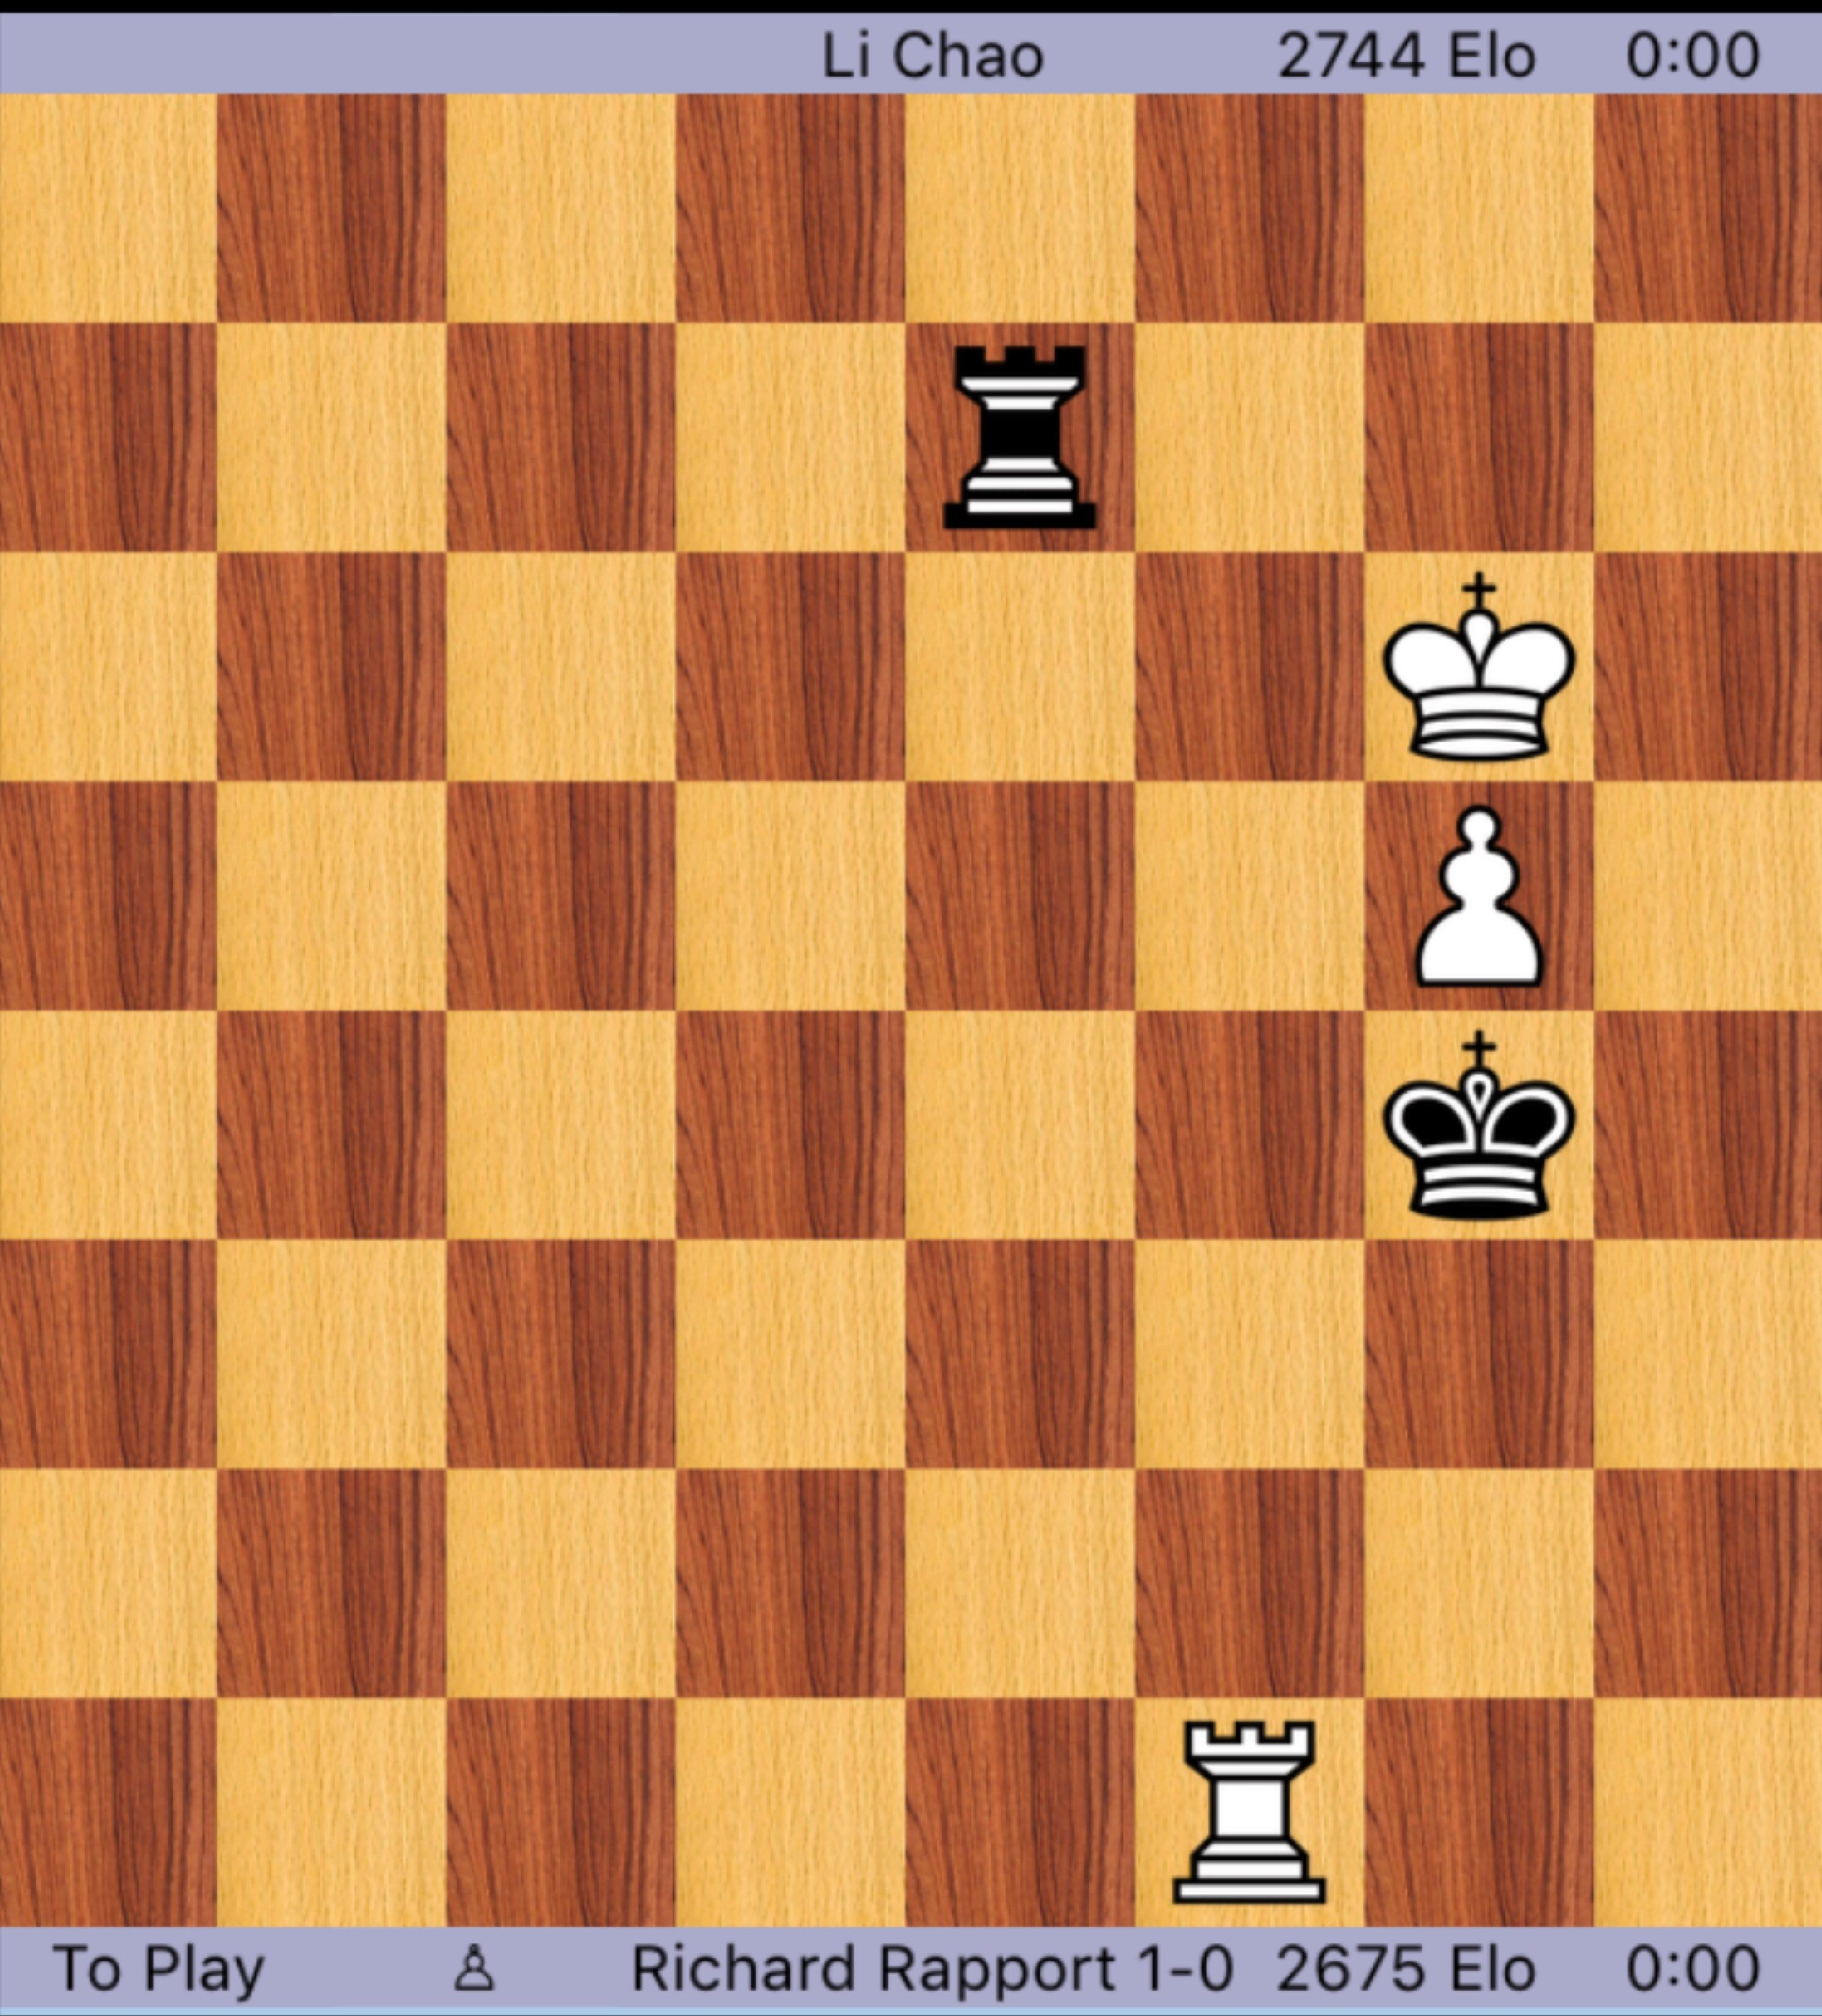 Chess Puzzles For Kids Printable – Orek - Printable Chess Puzzles